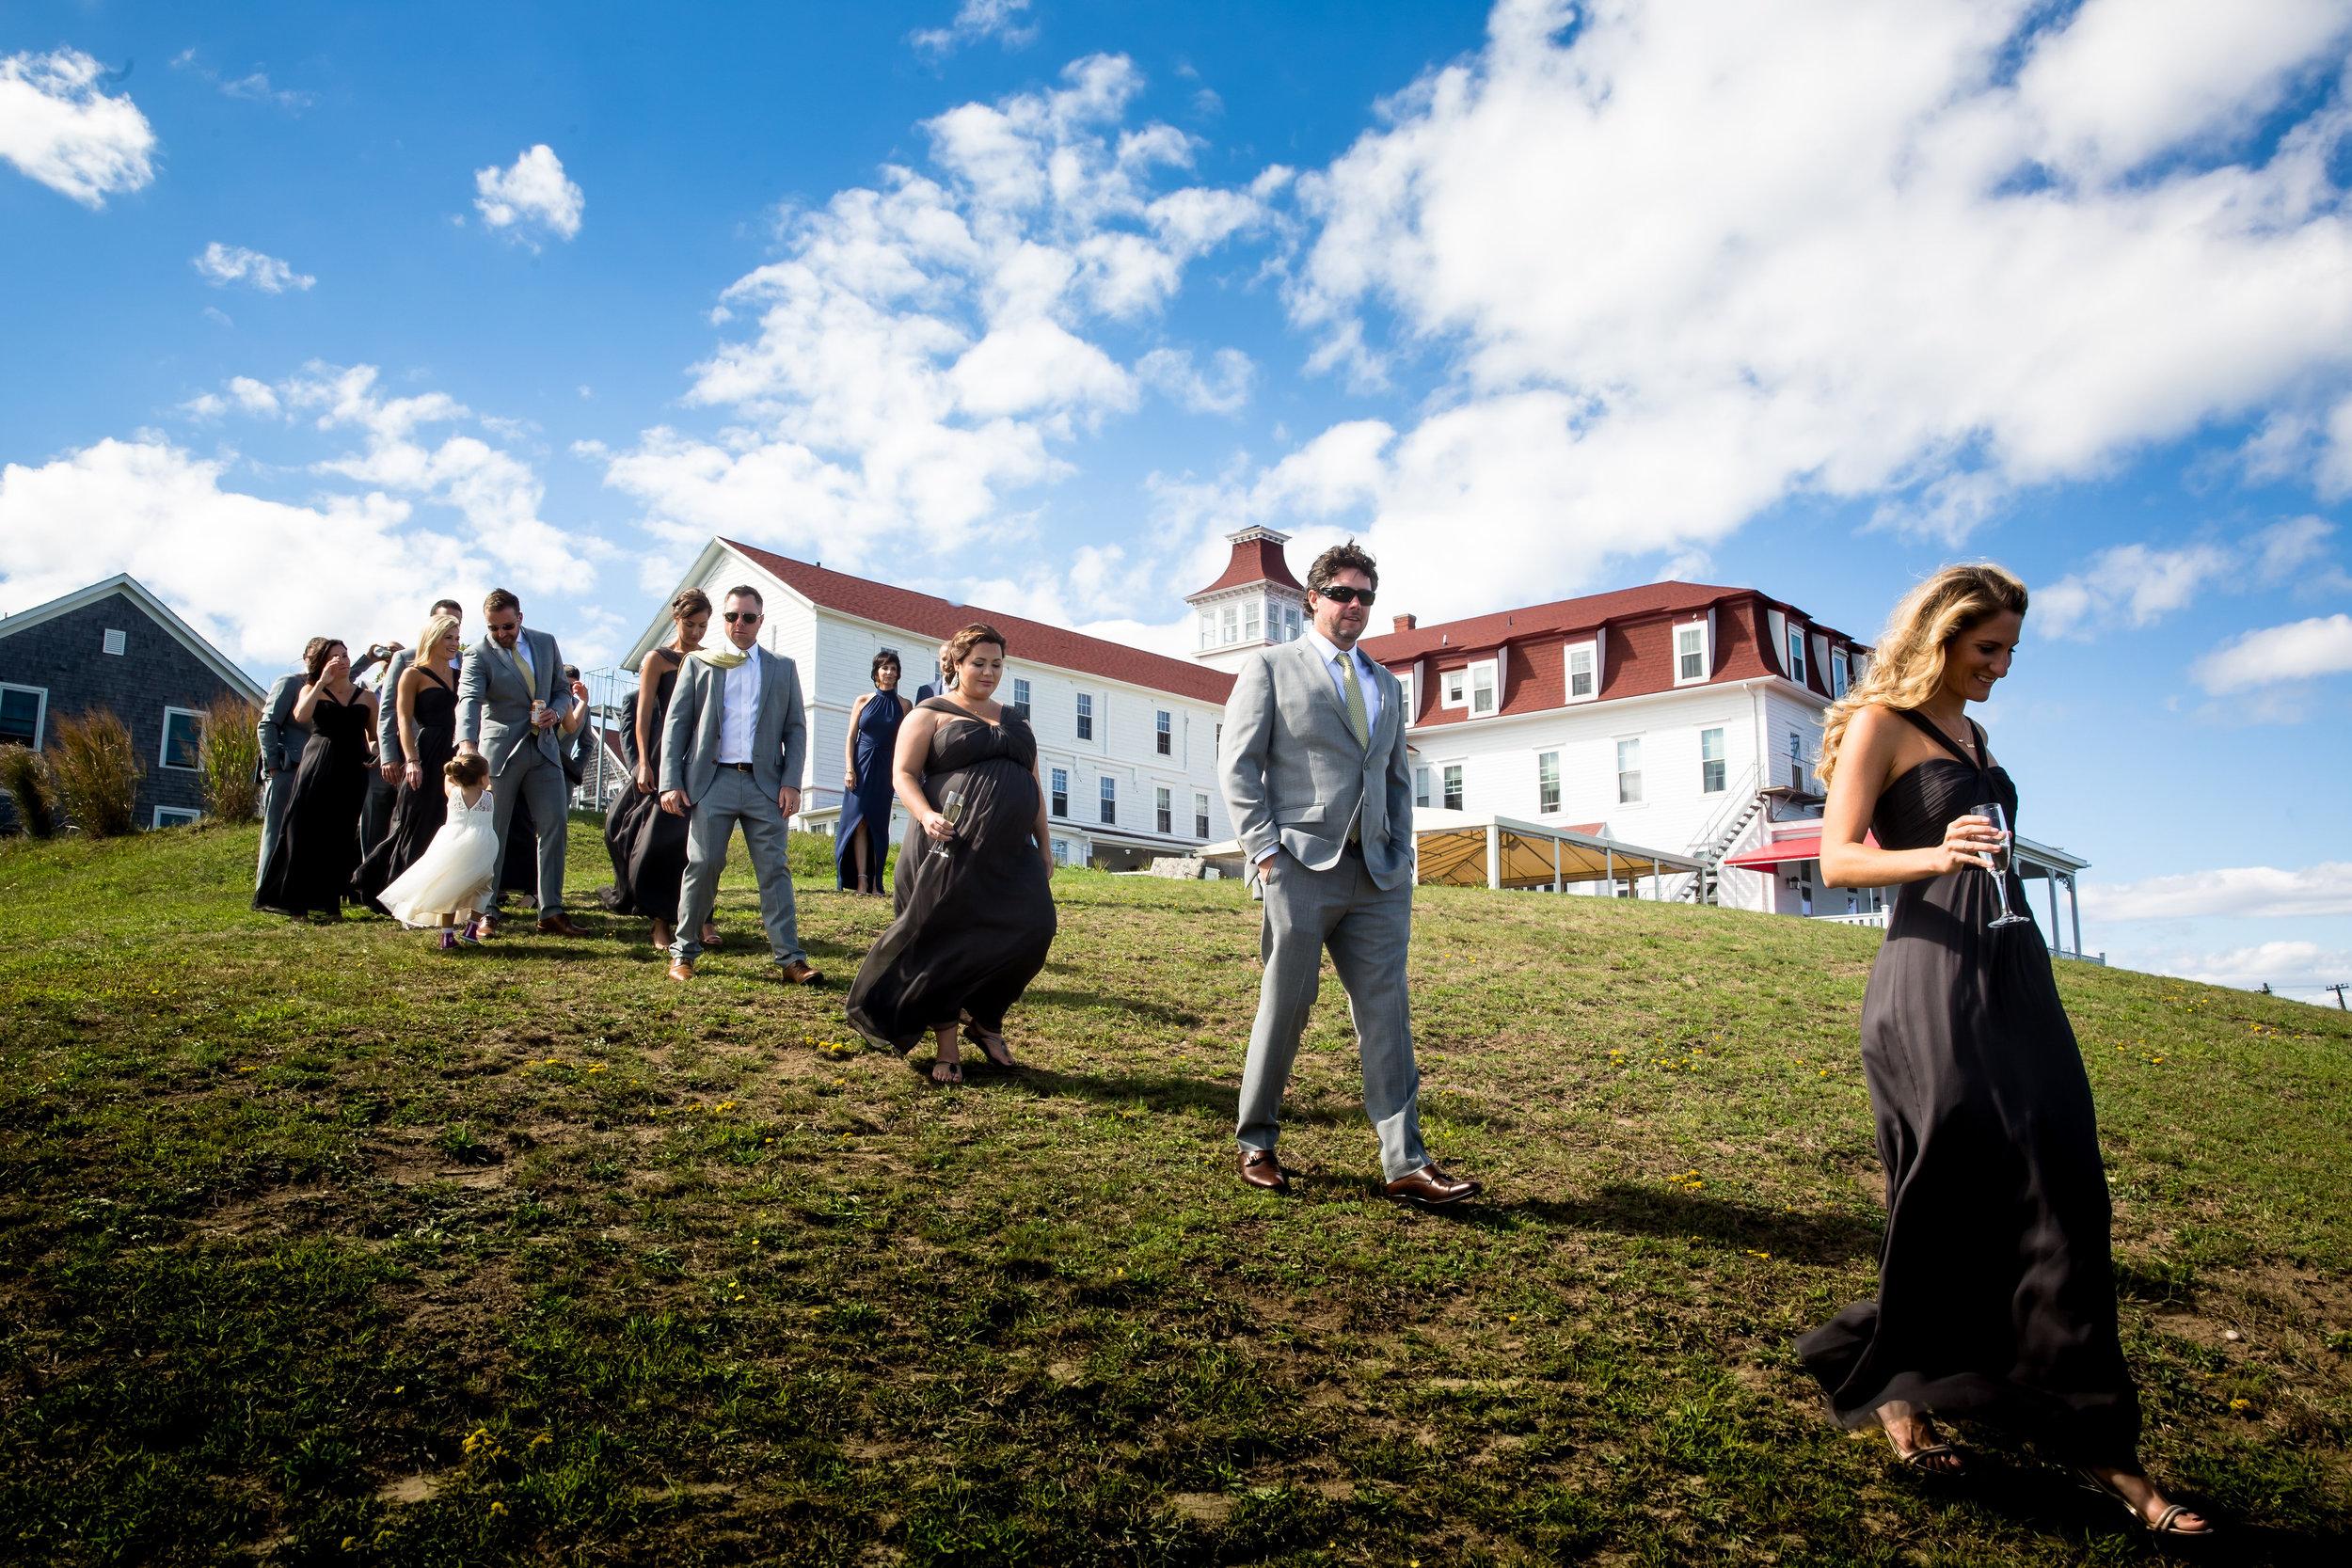 block-island-wedding-destination-wedding-0037.jpg